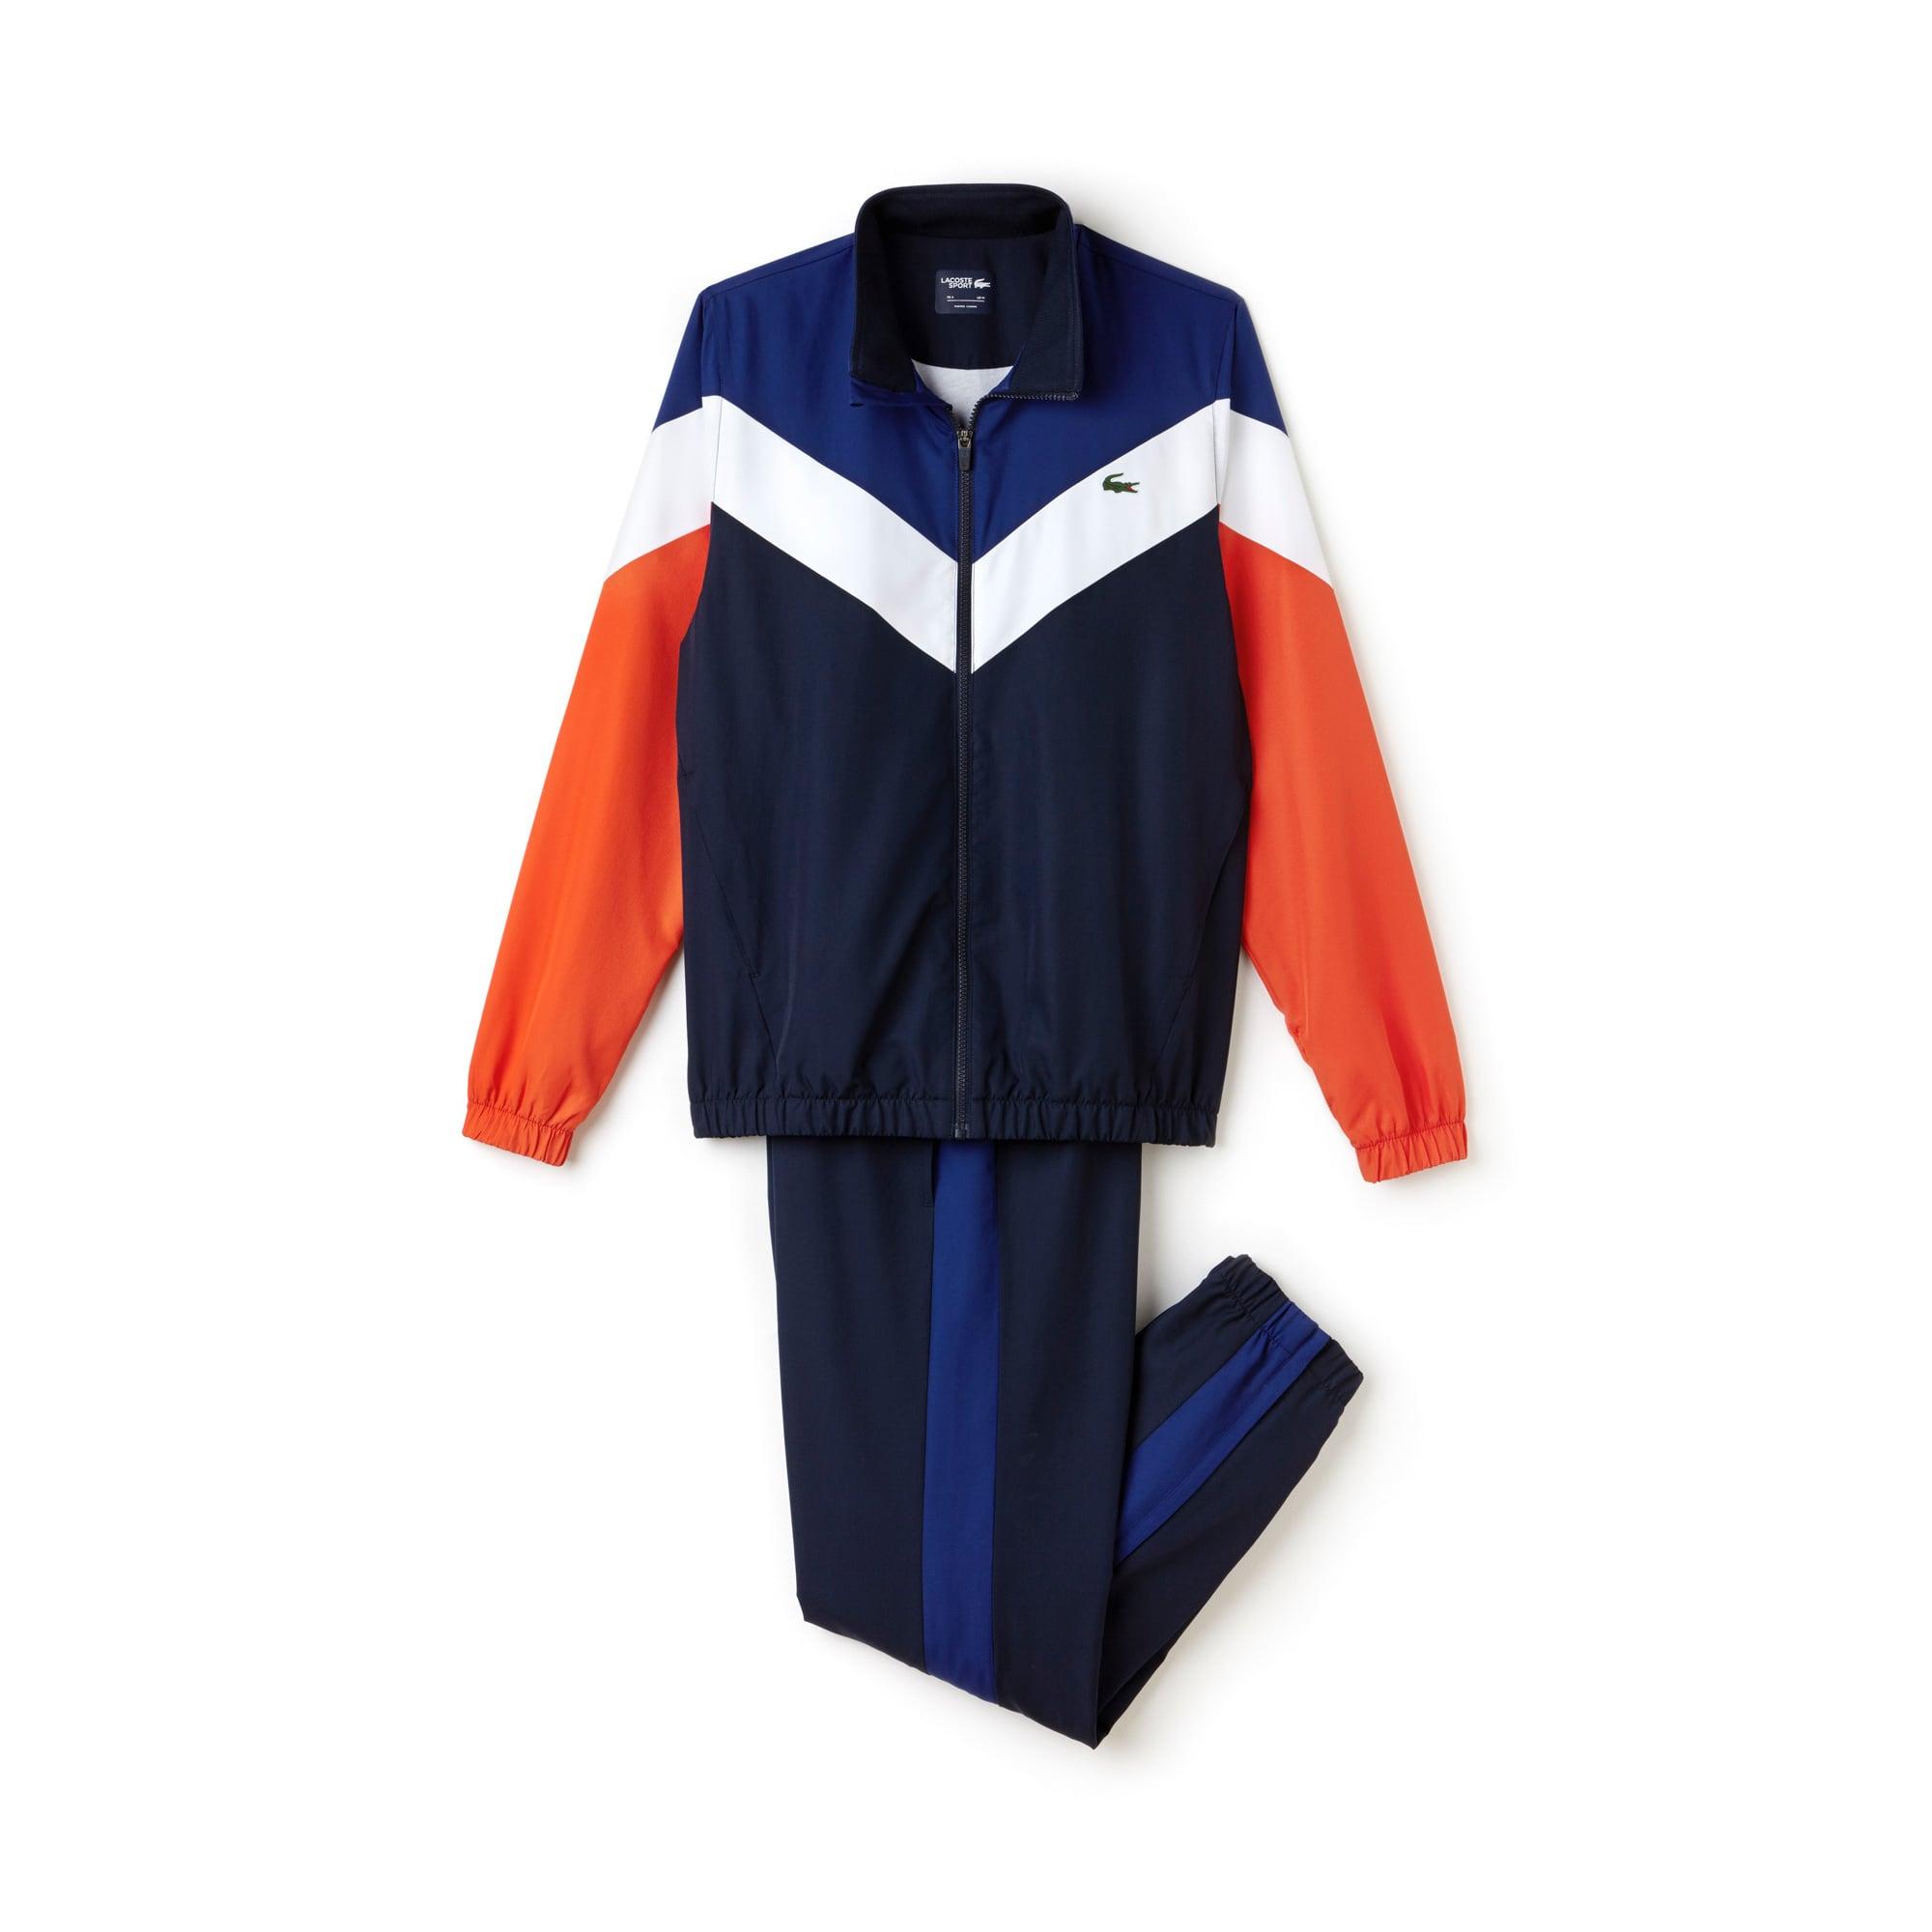 Tuta Tennis Lacoste SPORT color block